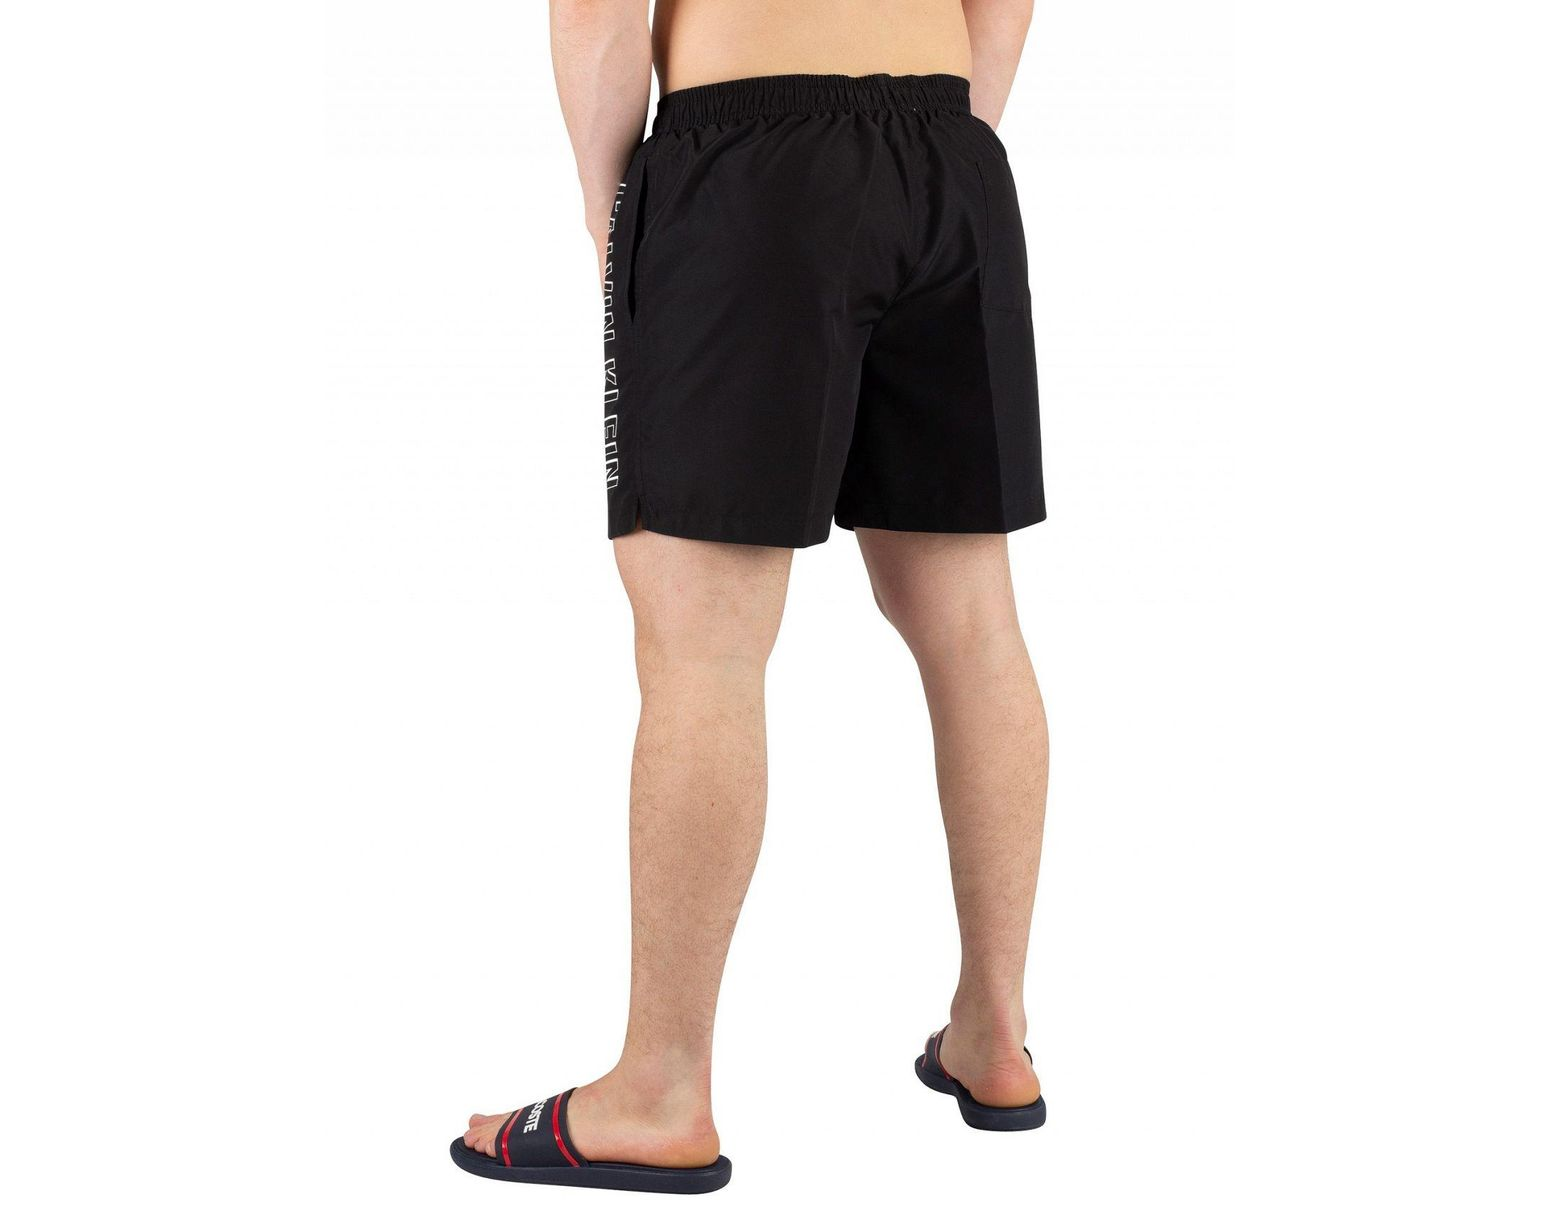 dd7929384f Calvin Klein Men's Medium Drawstring Swimshorts, Black Men's Shorts In  Black in Black for Men - Lyst